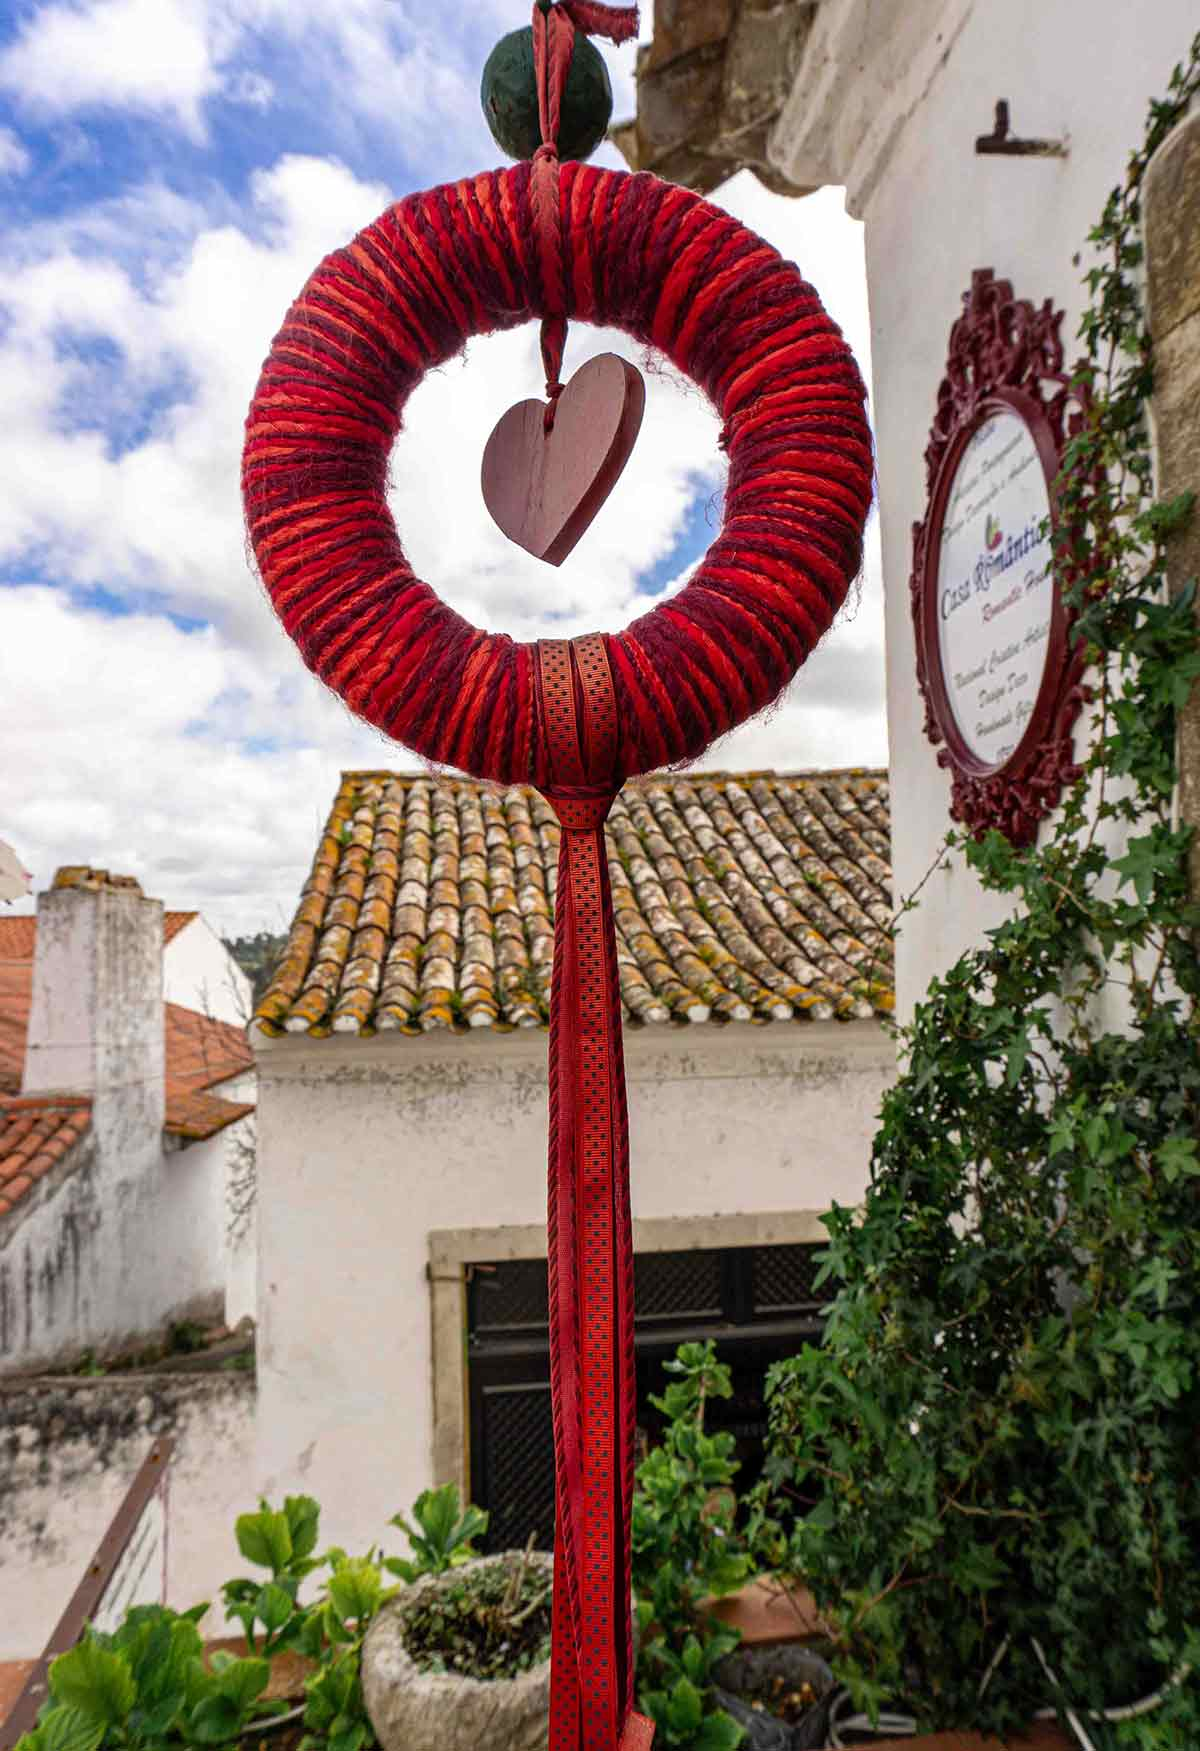 Loja Casa Romântica (Óbidos, Portugal)